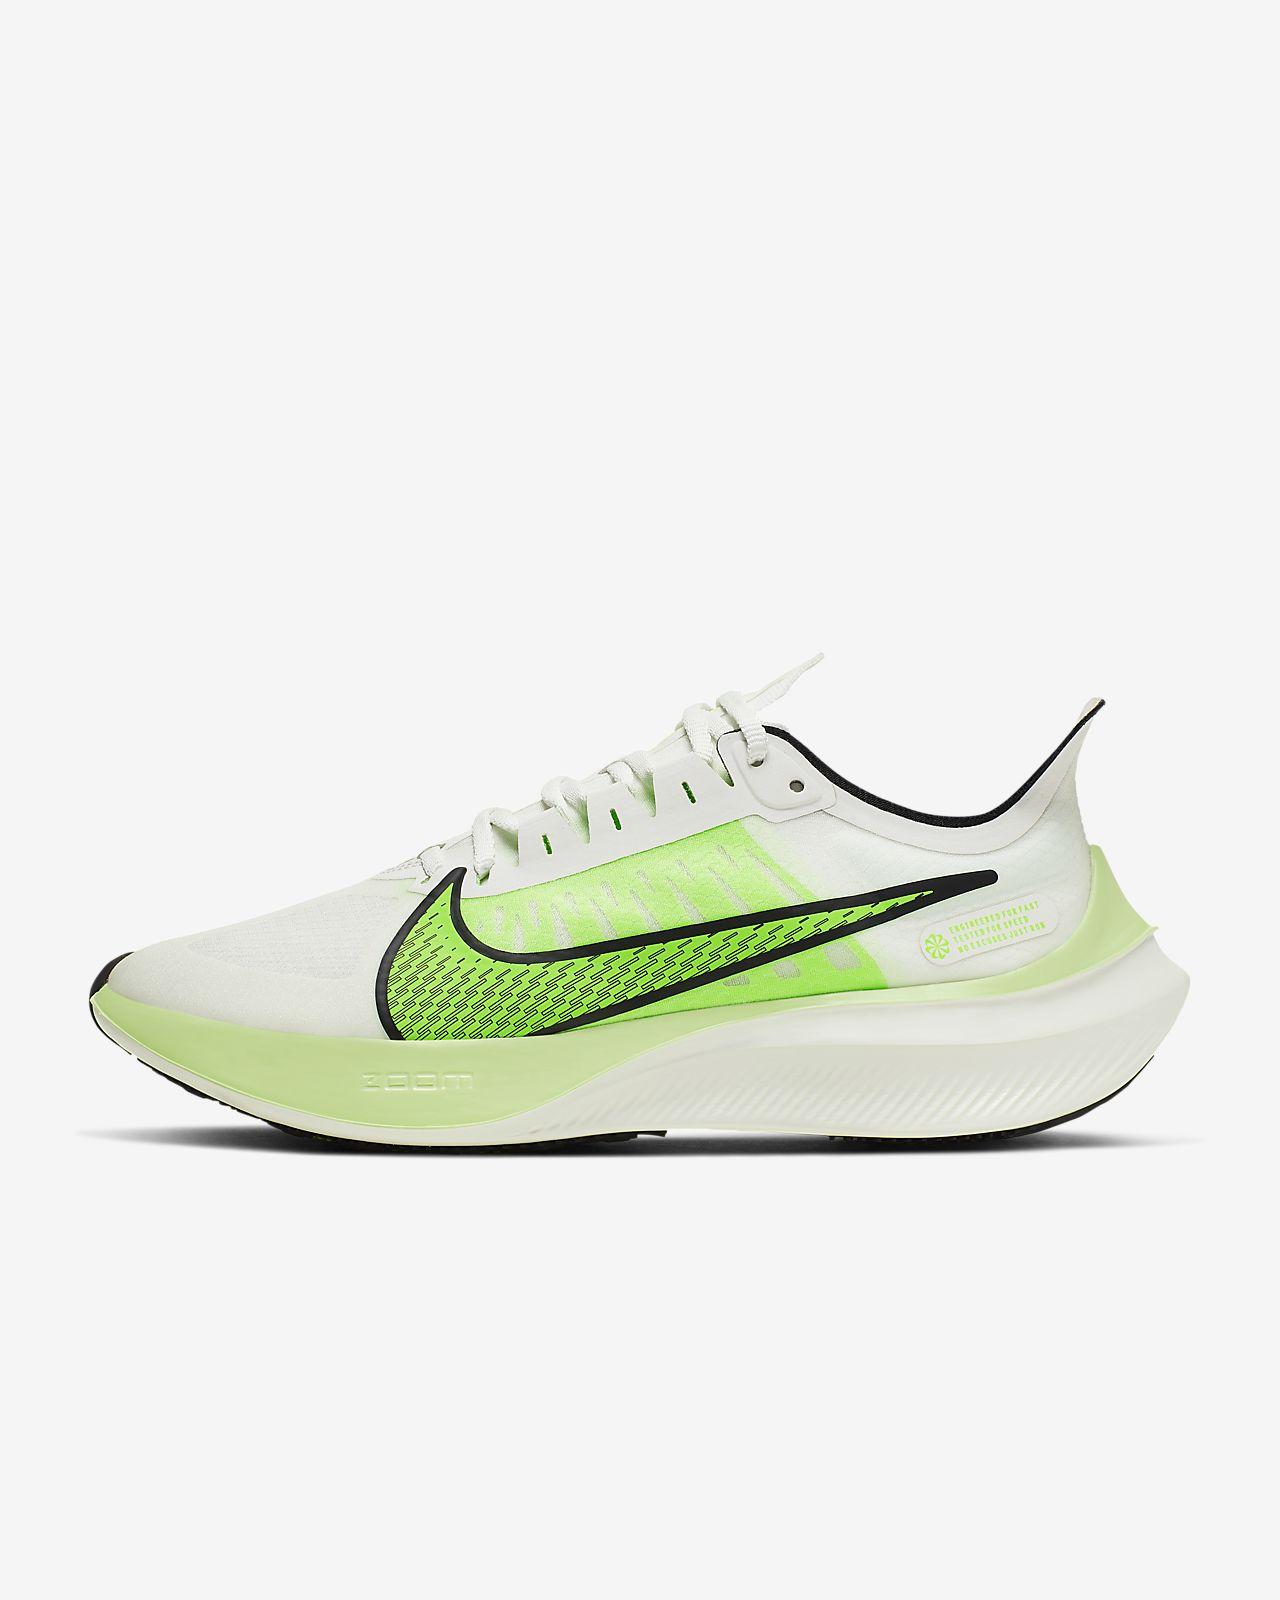 Nike Zoom Gravity Damen-Laufschuh